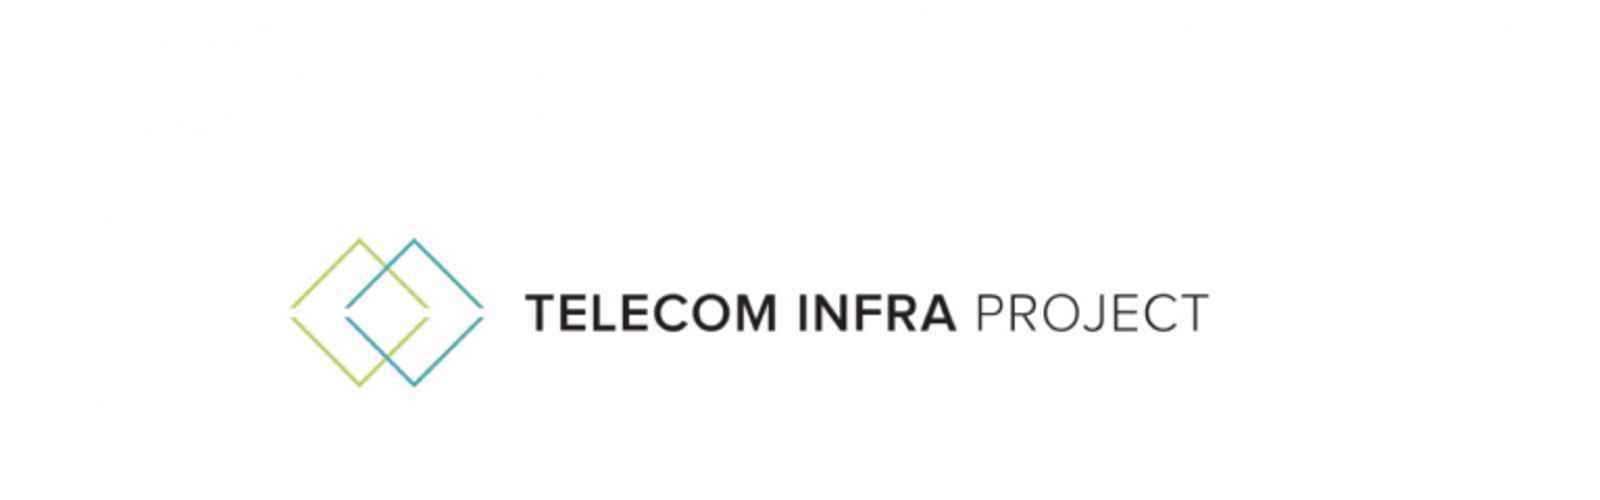 Telzio, Facebook, Deutsche Telekom at Telecom Infra Project